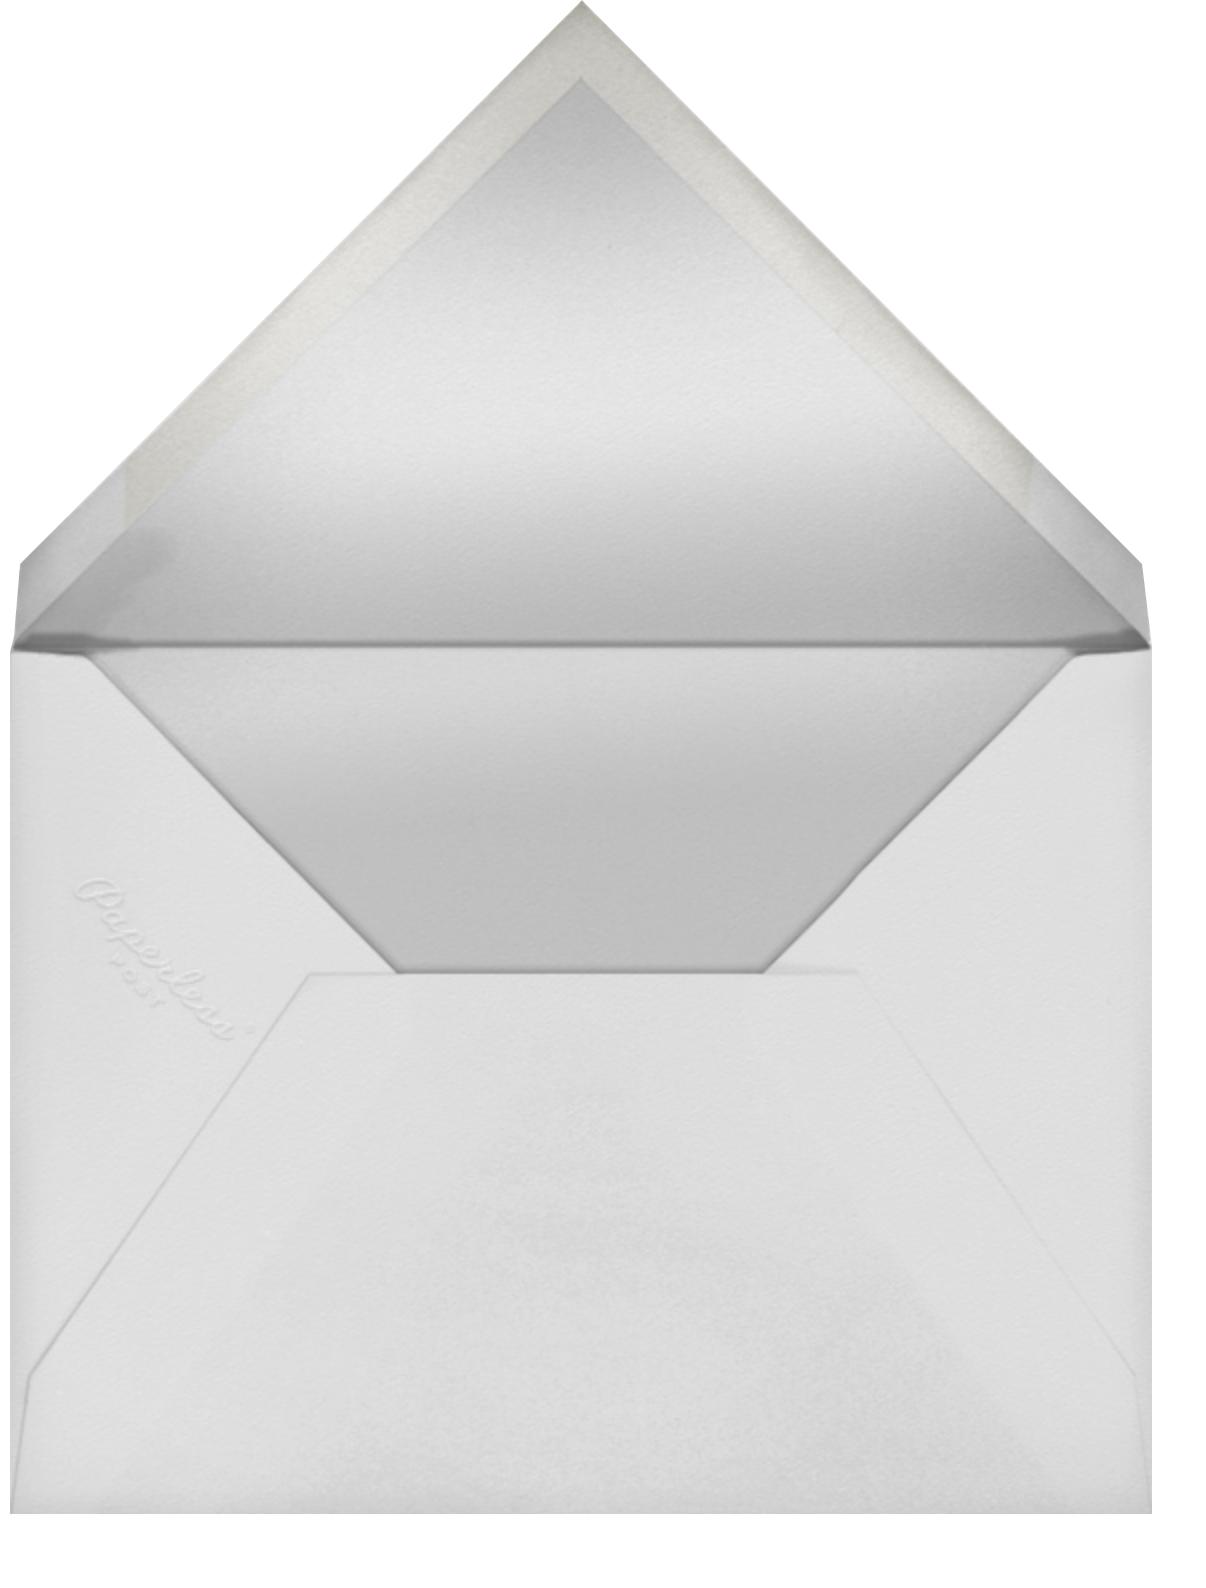 Gradient Full - Black - Paperless Post - Engagement party - envelope back